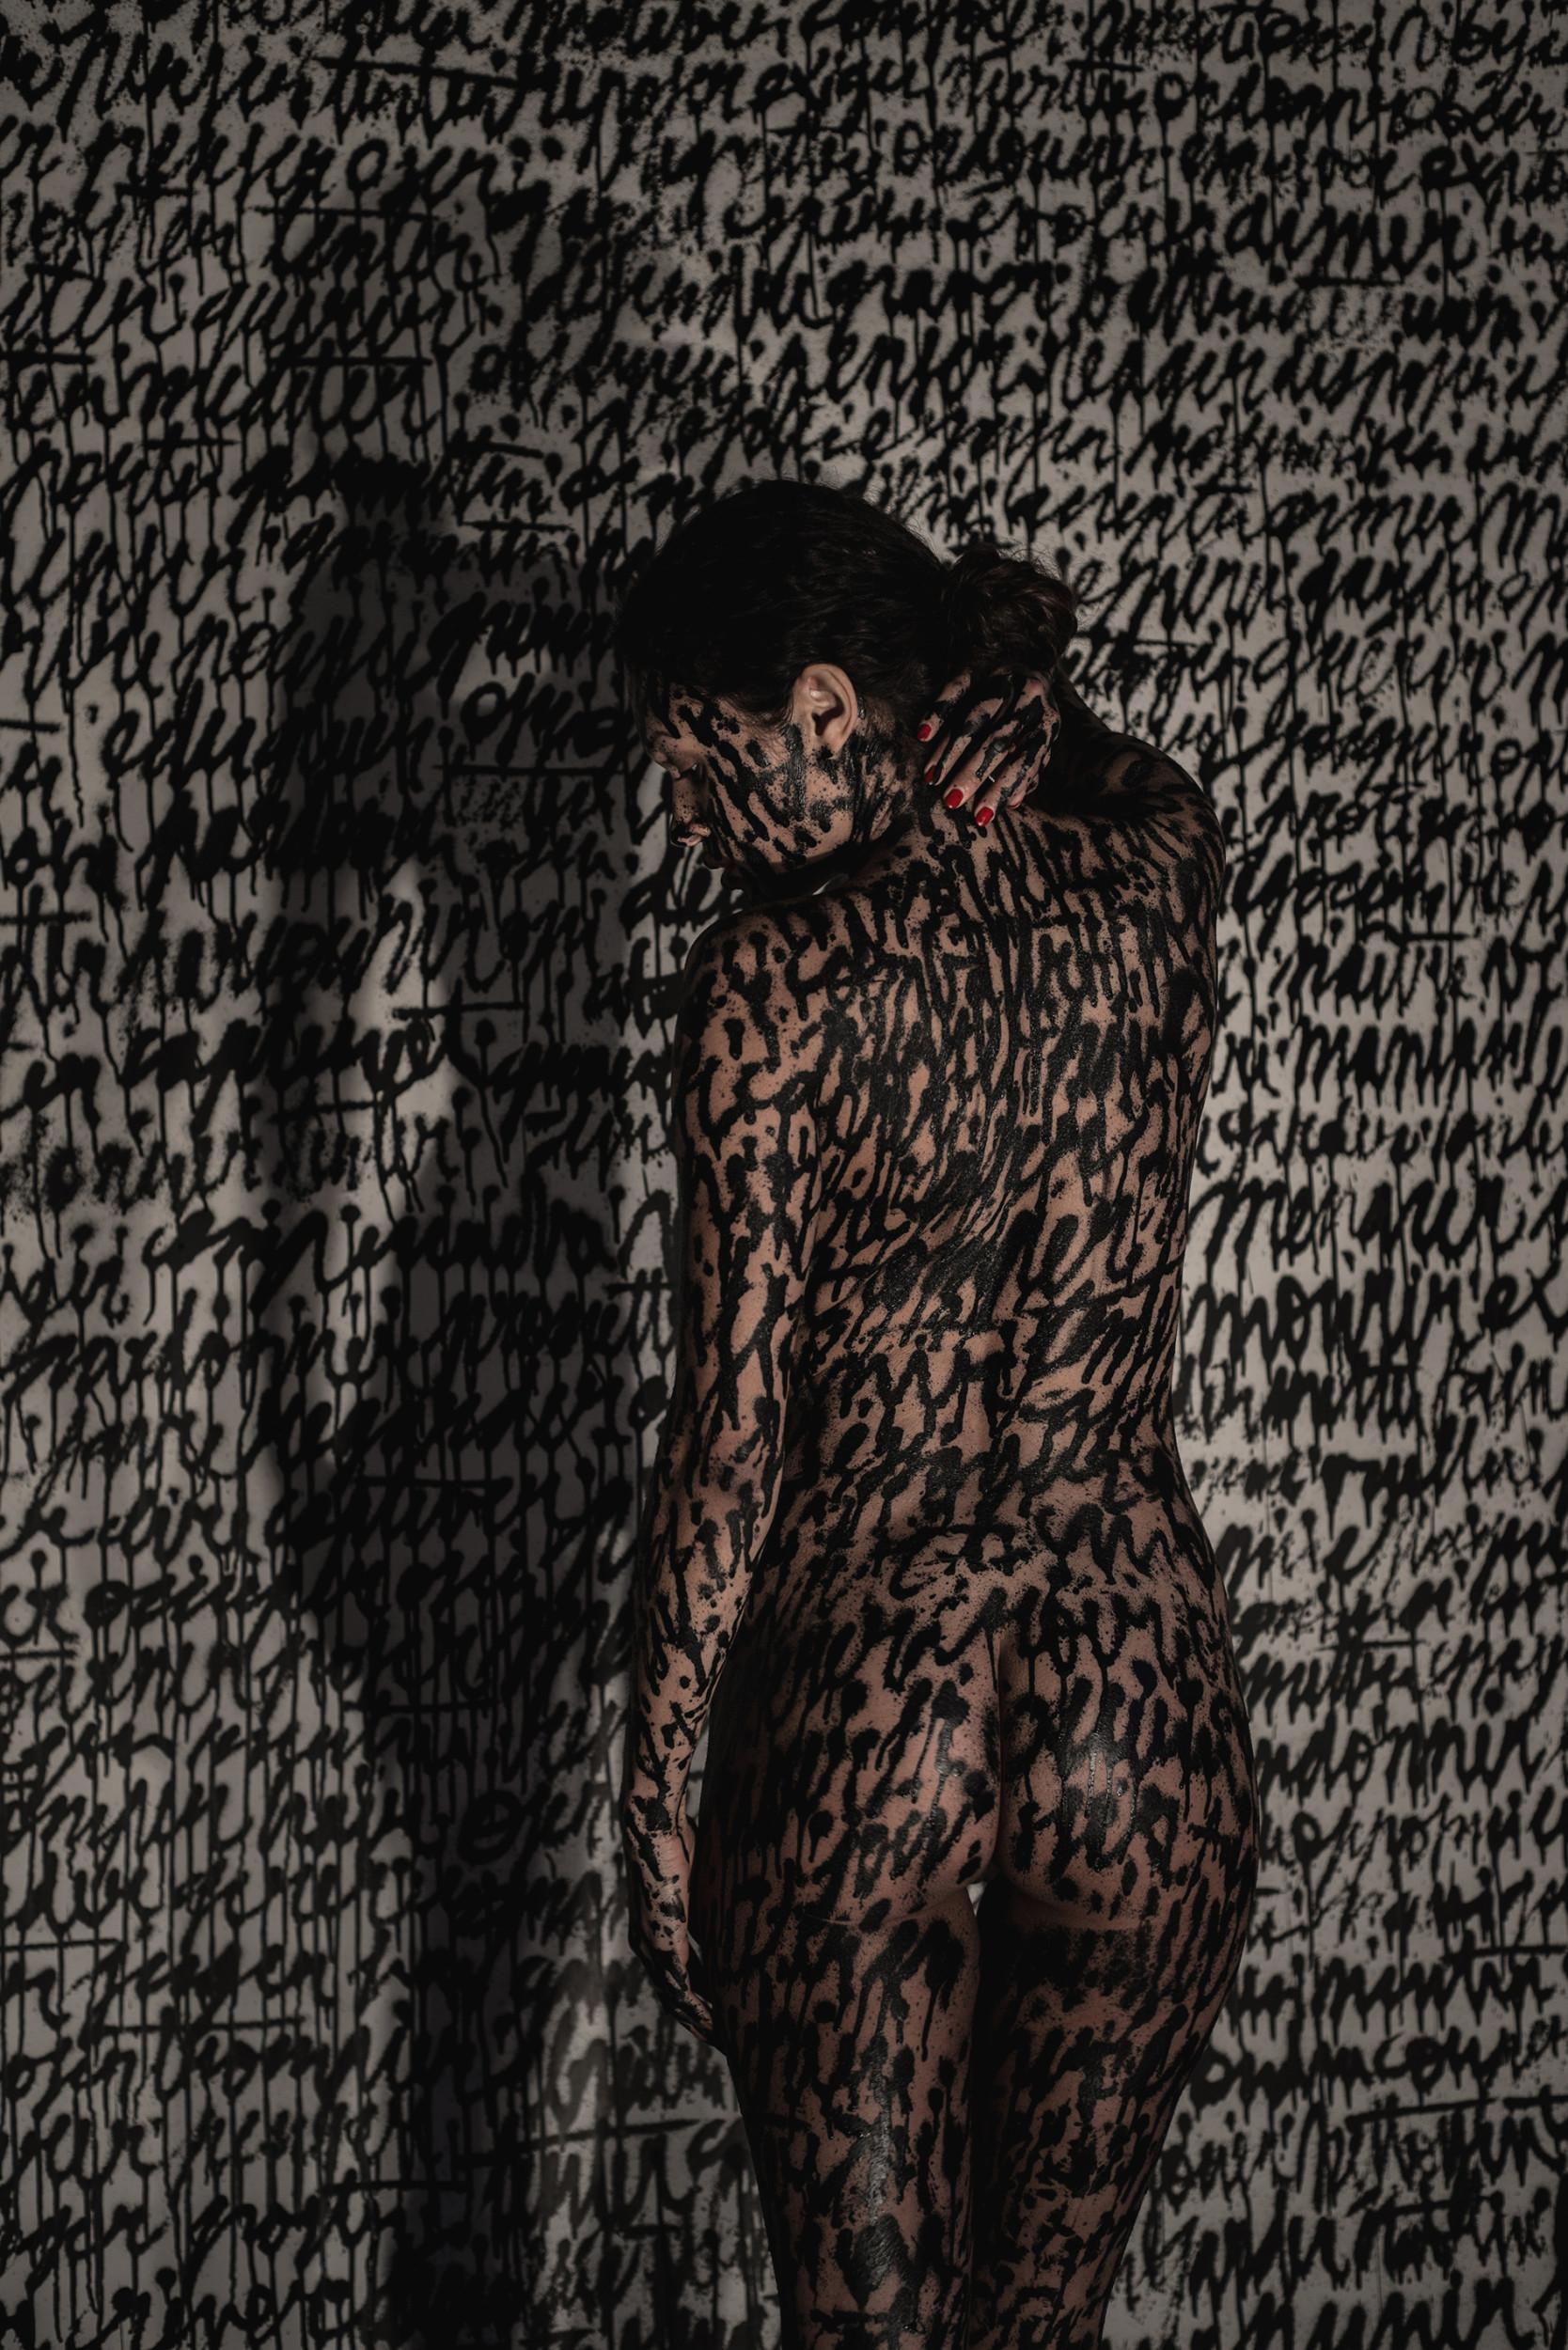 Denis Meyers S02 - Leonhard's Gallery